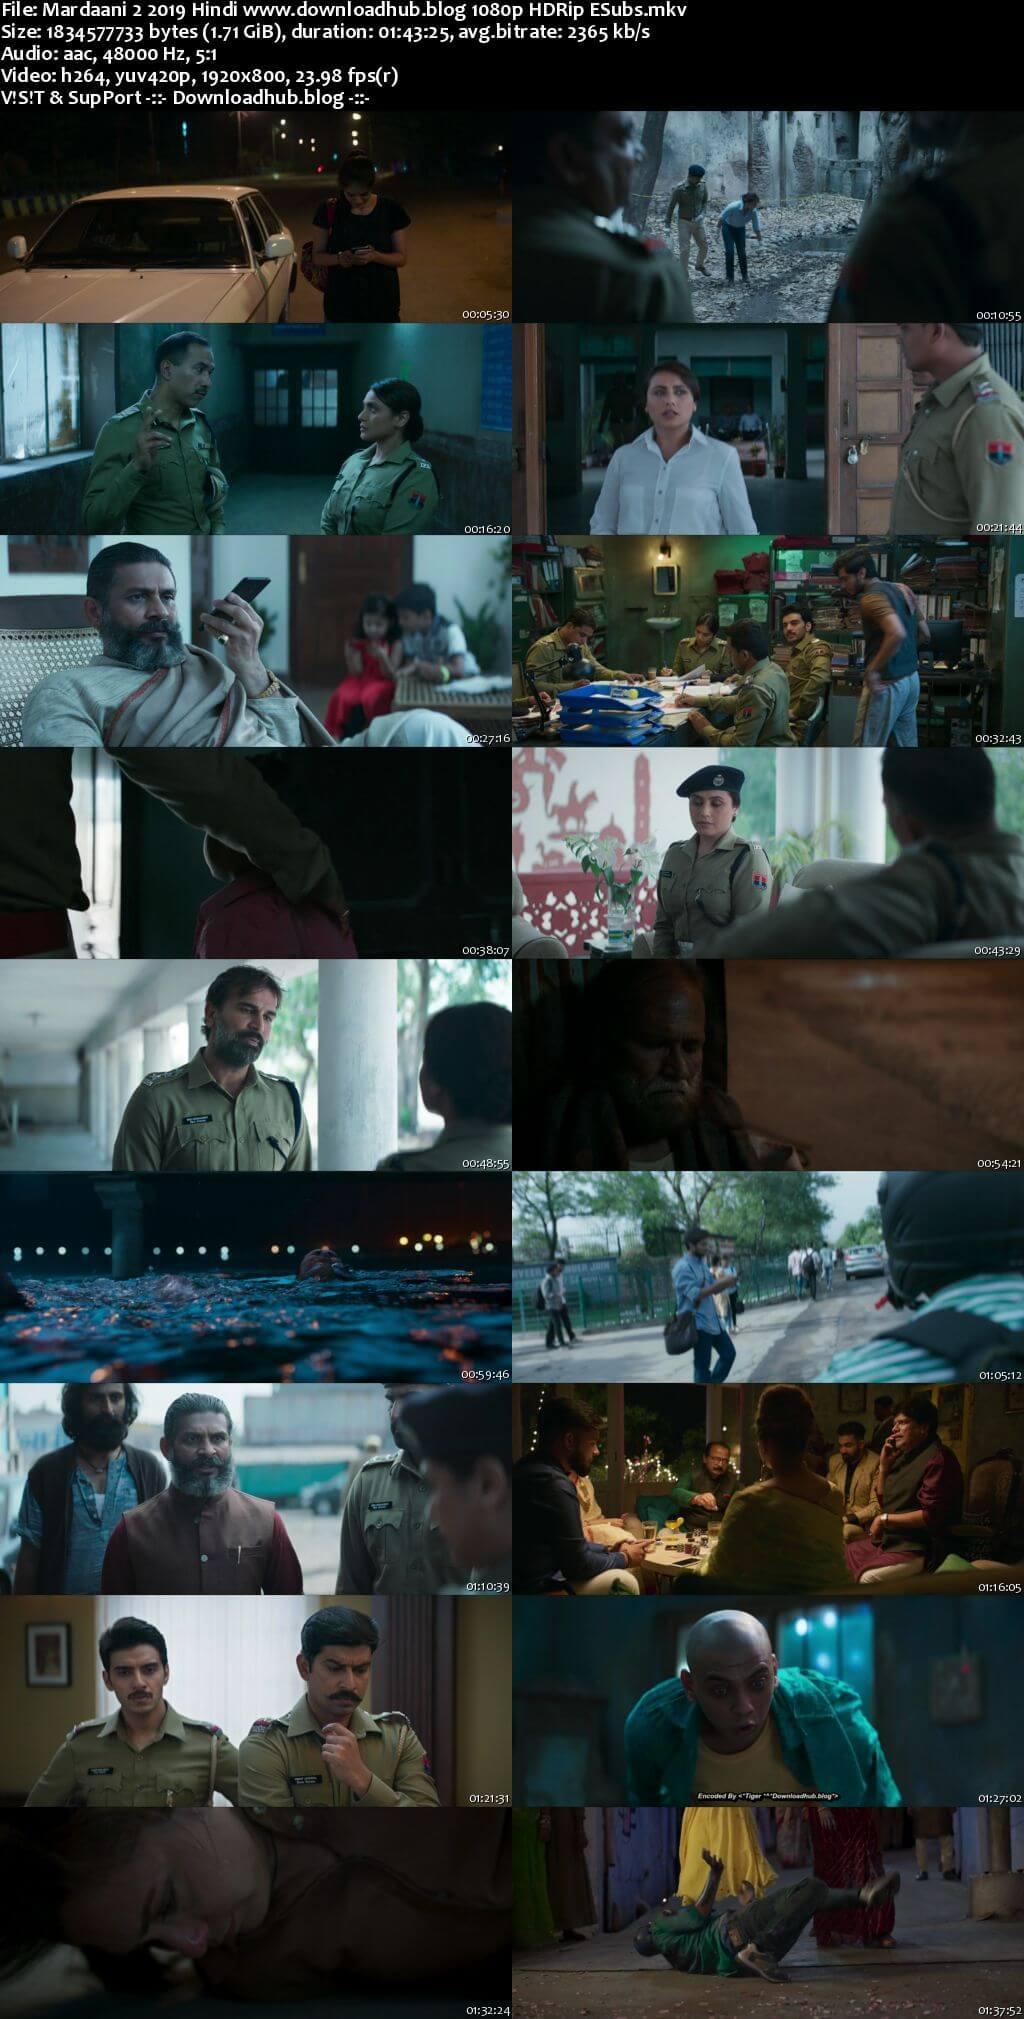 Mardaani 2 2019 Hindi 1080p HDRip ESubs